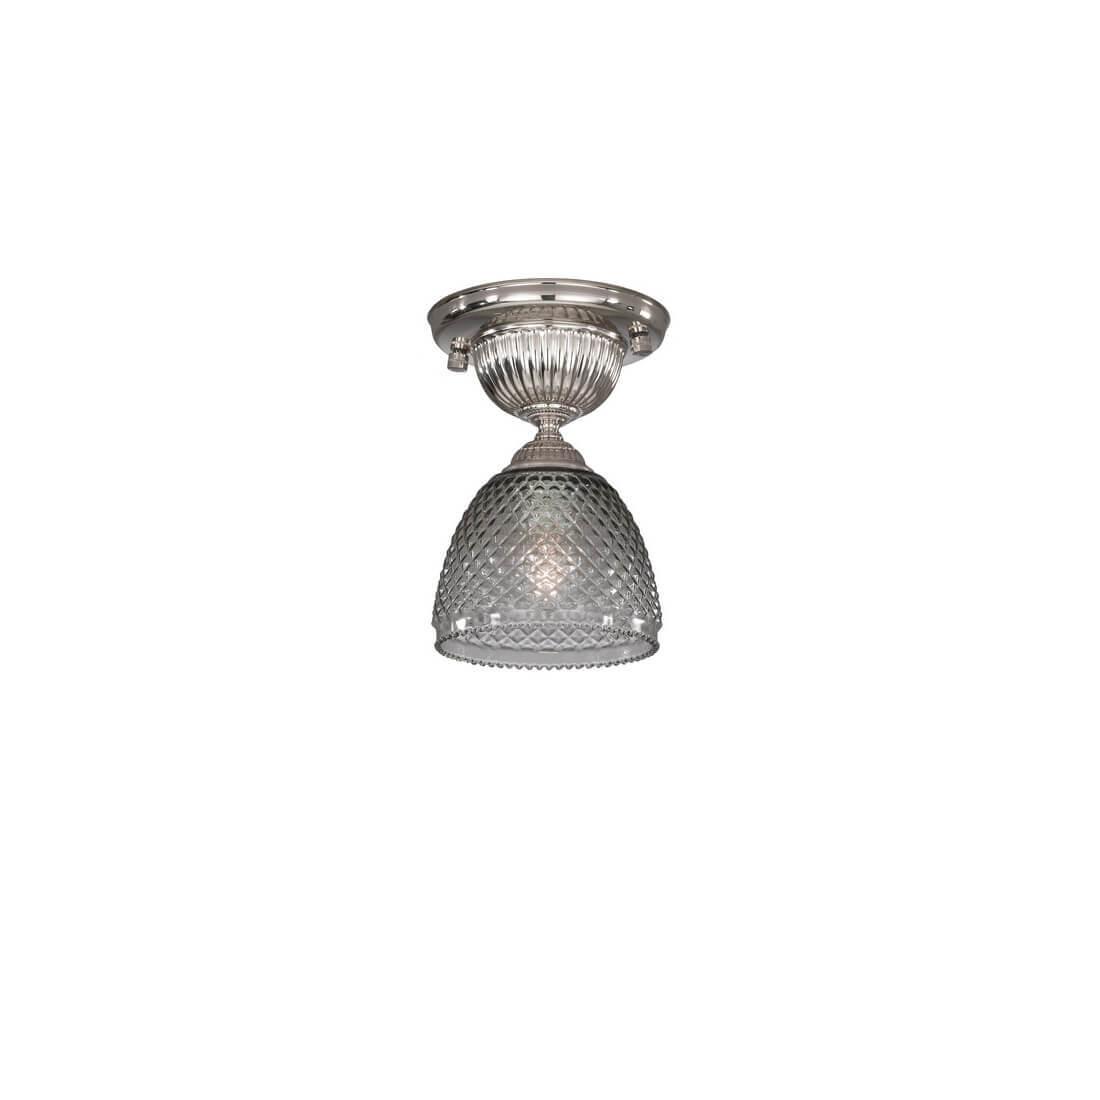 Светильник Reccagni Angelo PL 9801/1 9801 потолочная люстра reccagni angelo pl 8625 3